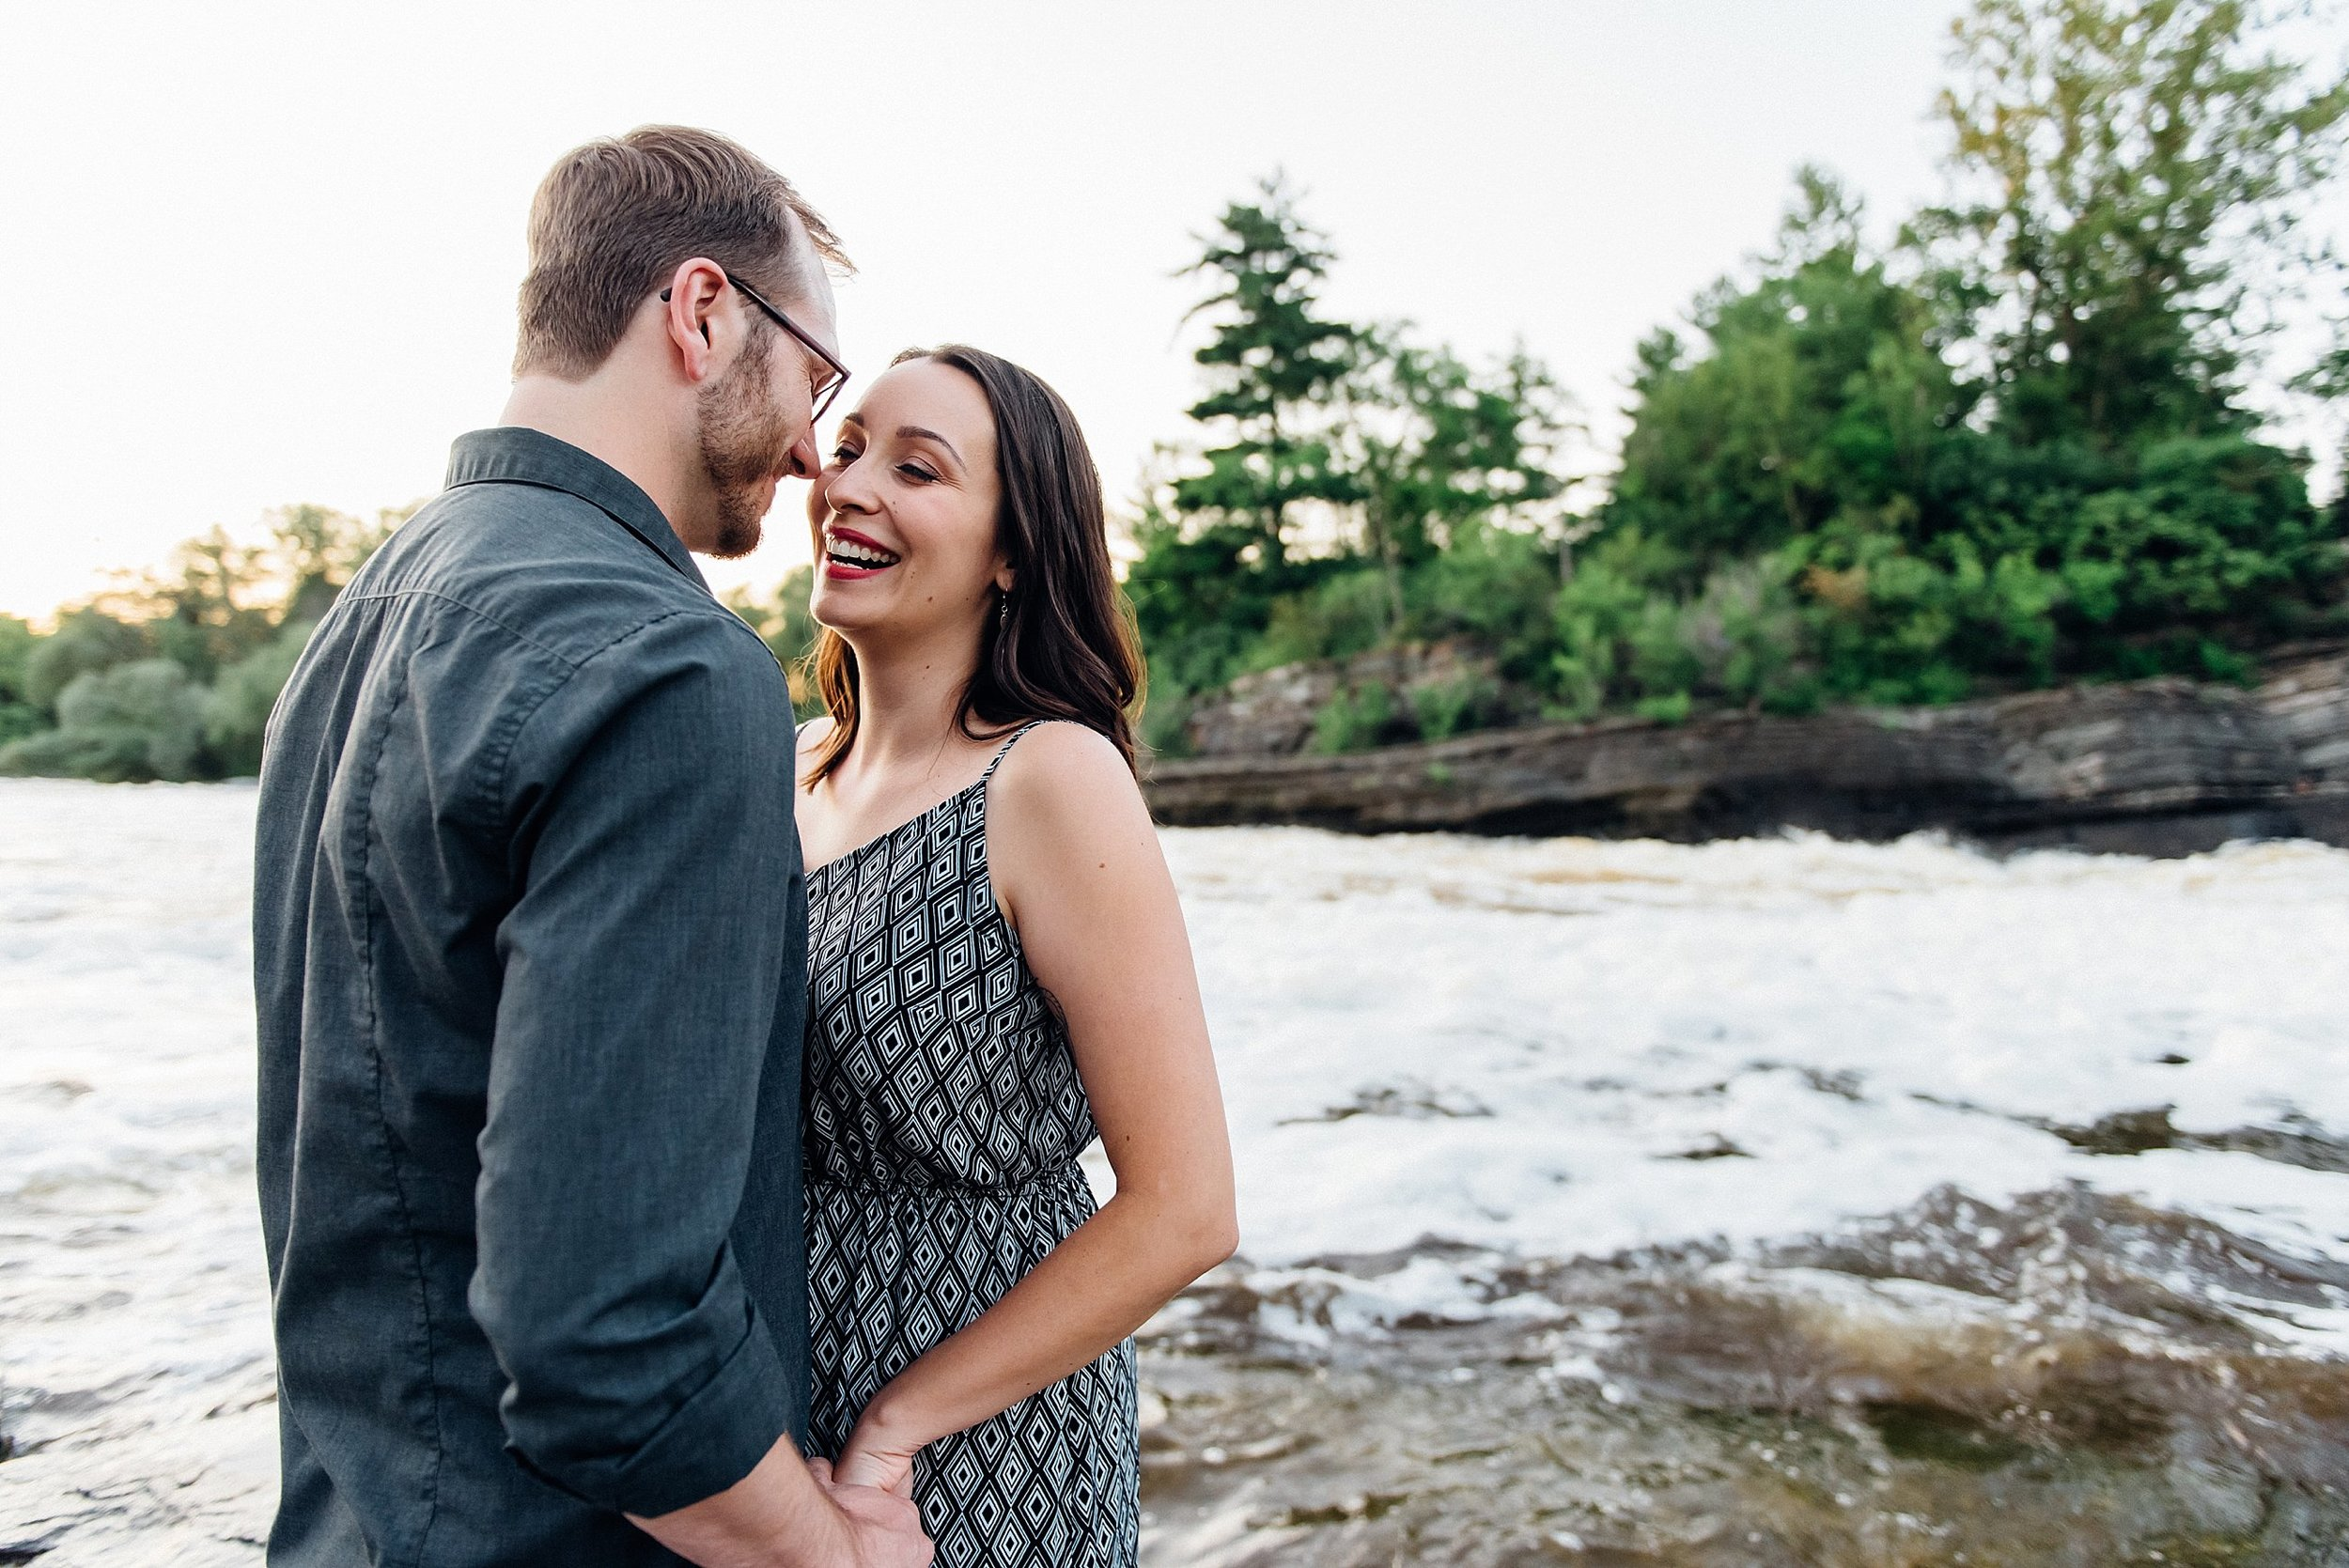 light, airy, fine art, documentary ottawa wedding photographer - best engagement photos 2017_0030.jpg